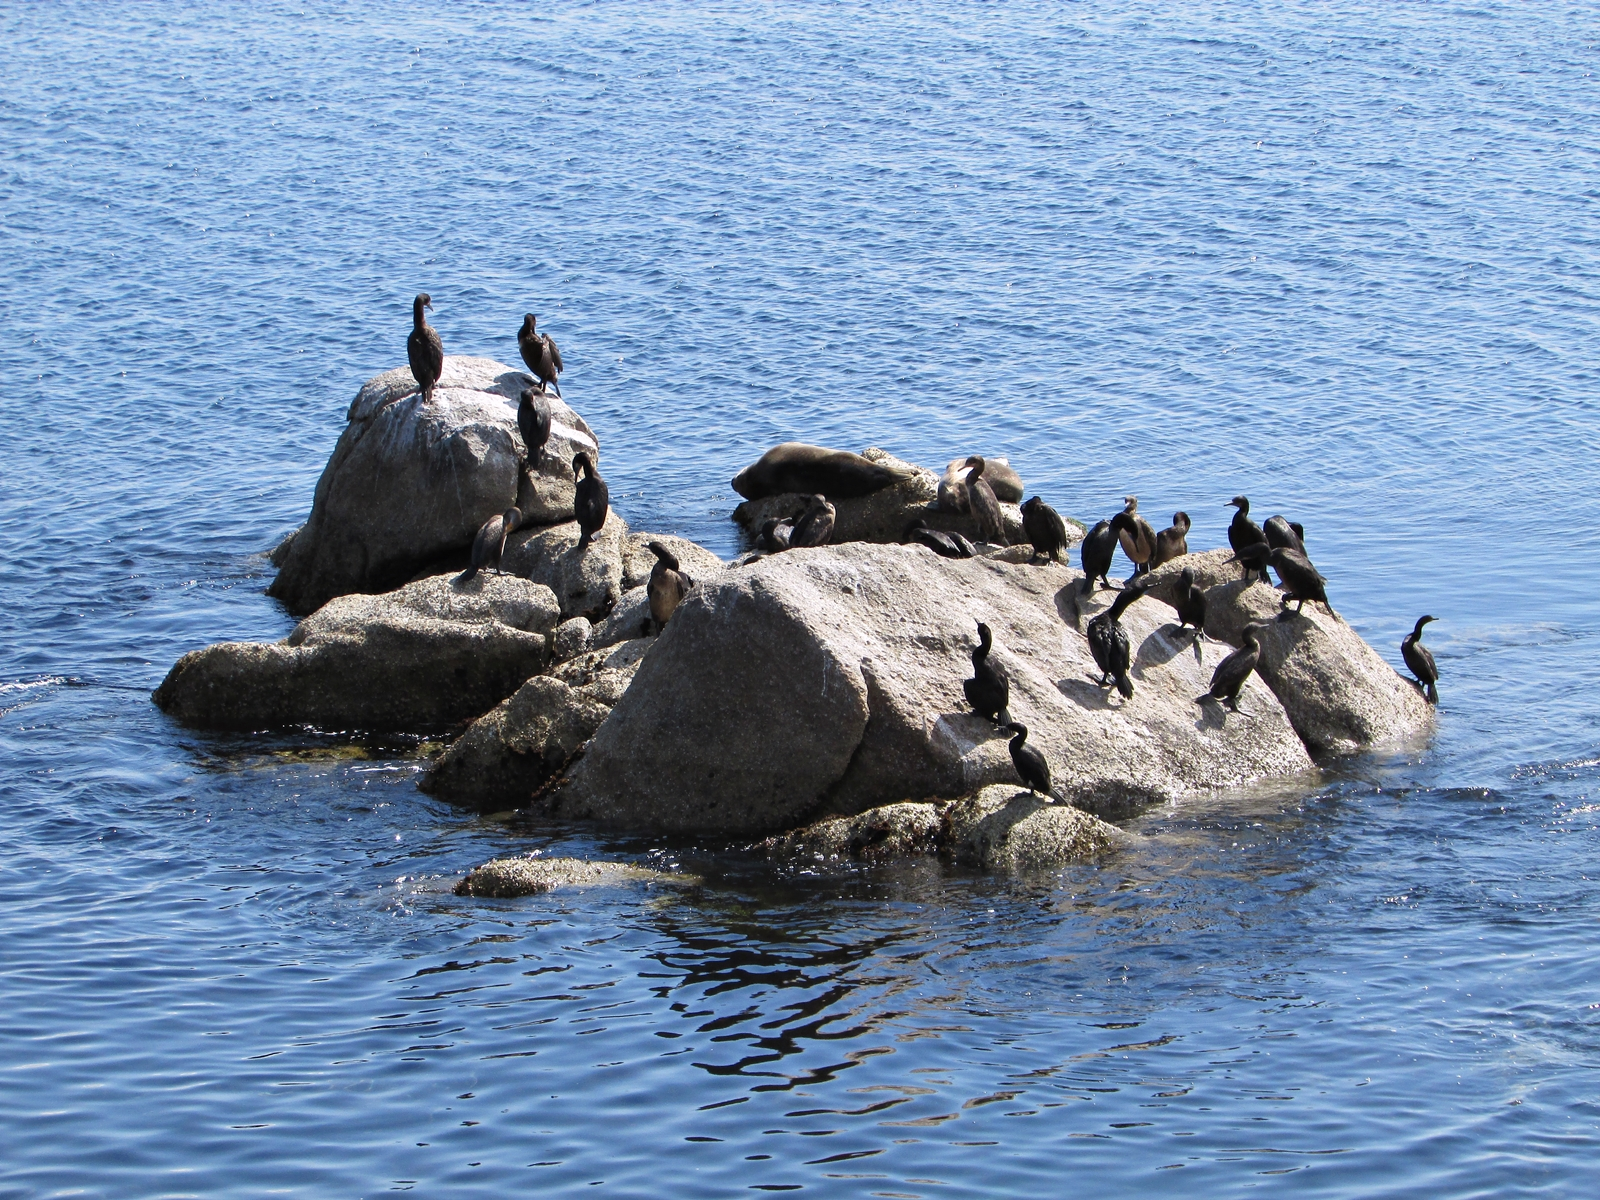 USA Rundreise - Amerika Westküste - Monterey - Monterey Bay Aquarium - Fashionladyloves - Travelblog - Reise Blog